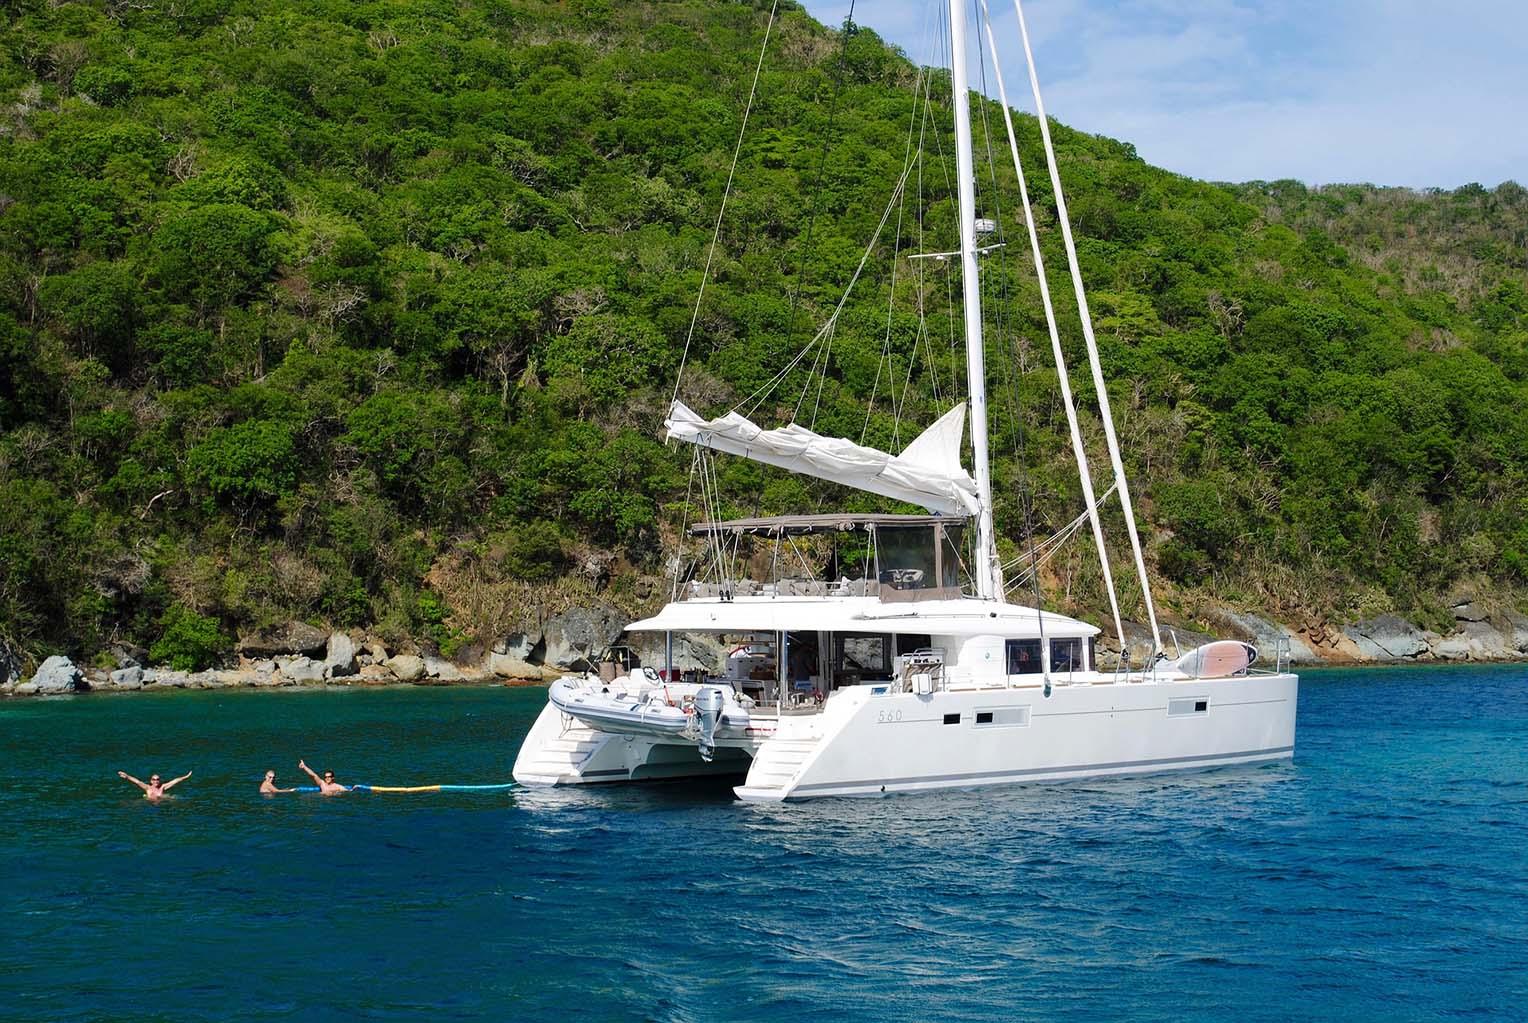 Sailing catamaran in Croatia